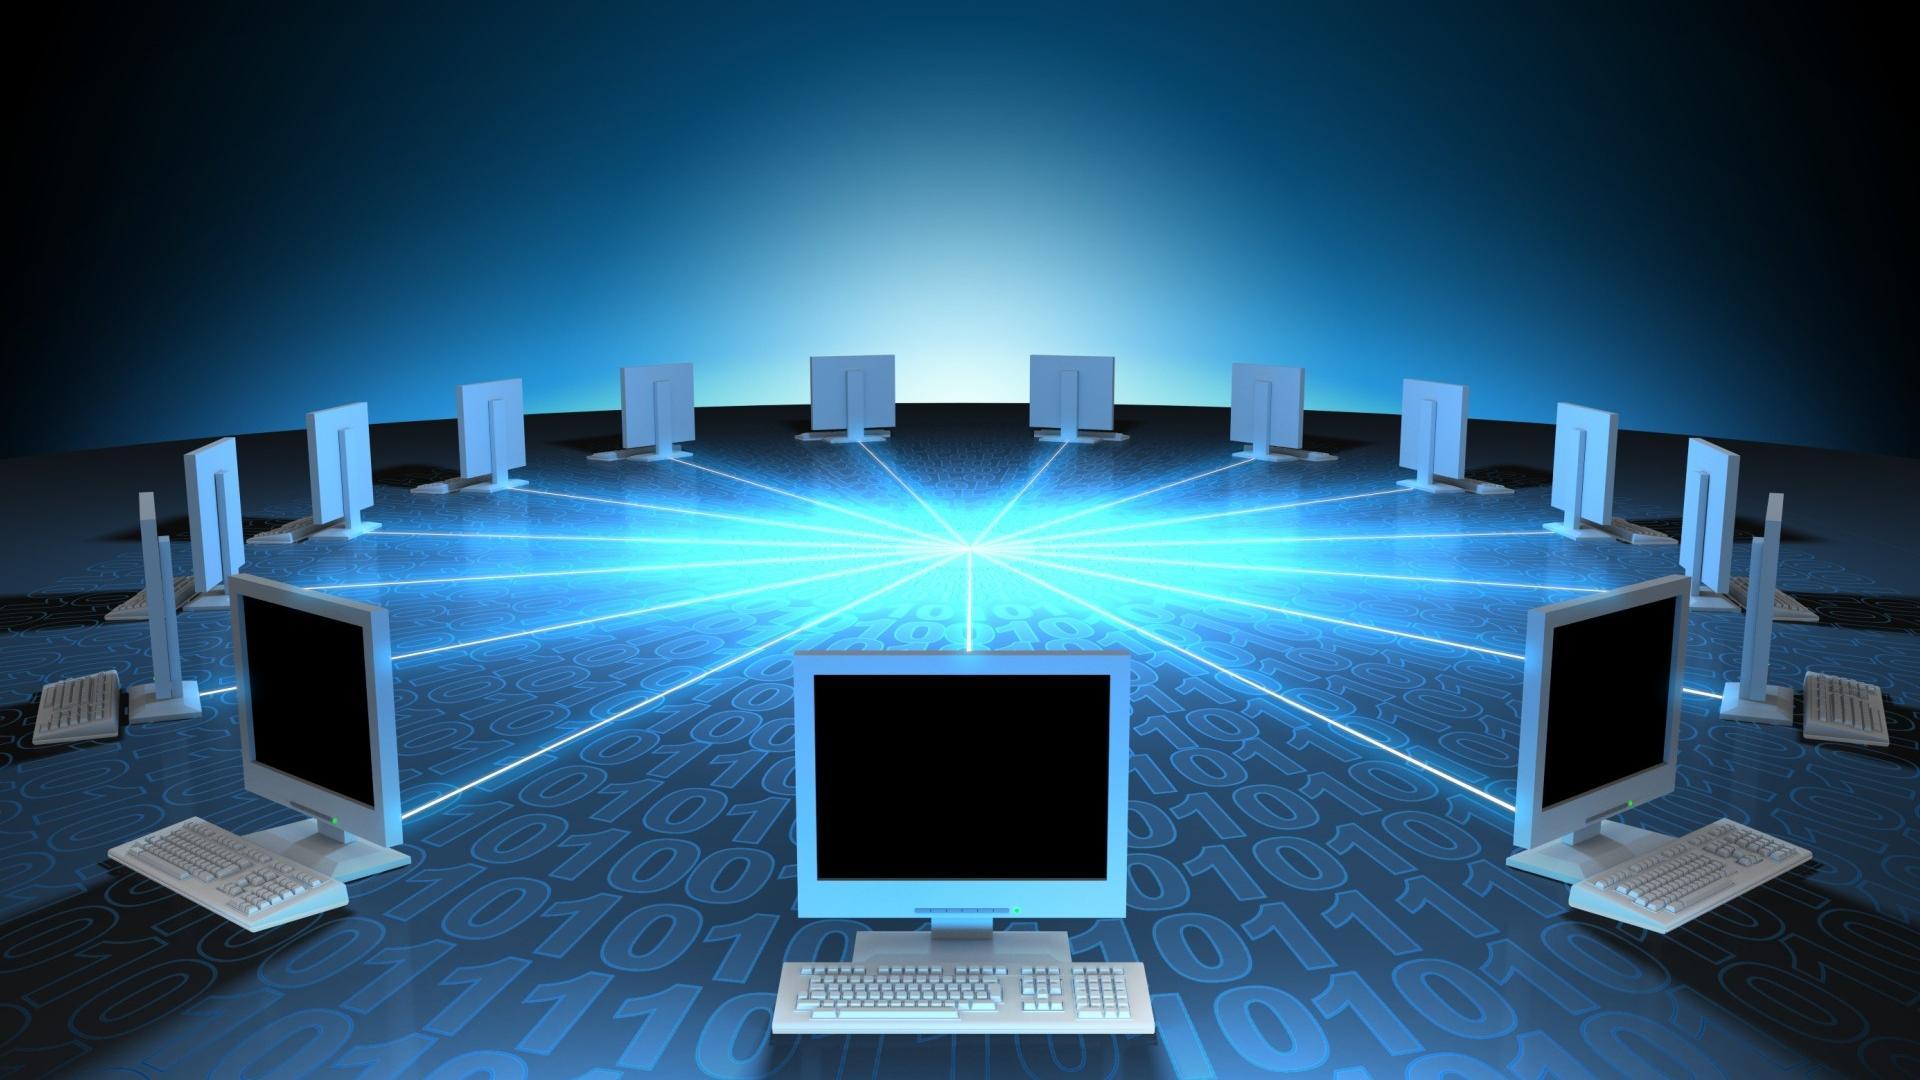 Detailed Description Computer Networks LAN WAN MAN